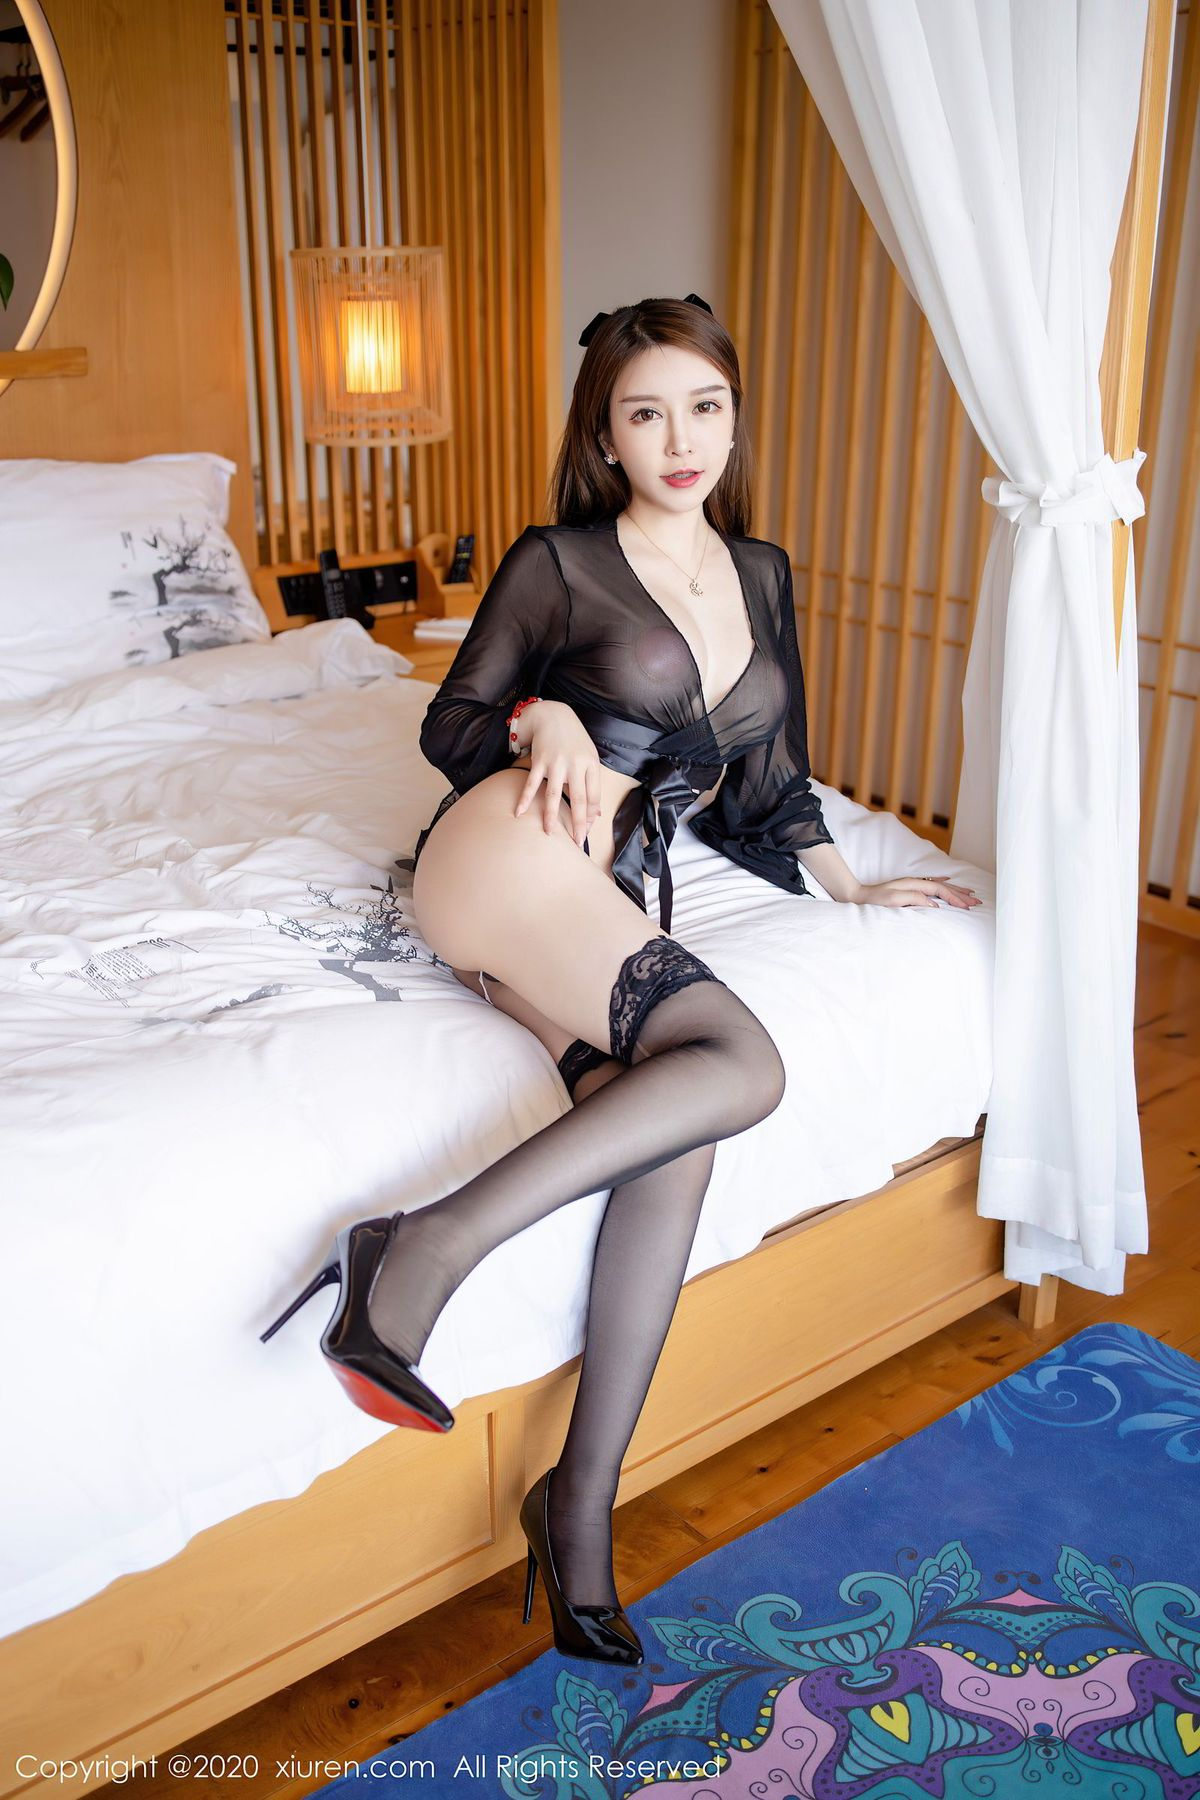 [XiuRen] 2020.07.06 No.2292 玉兔miki_0